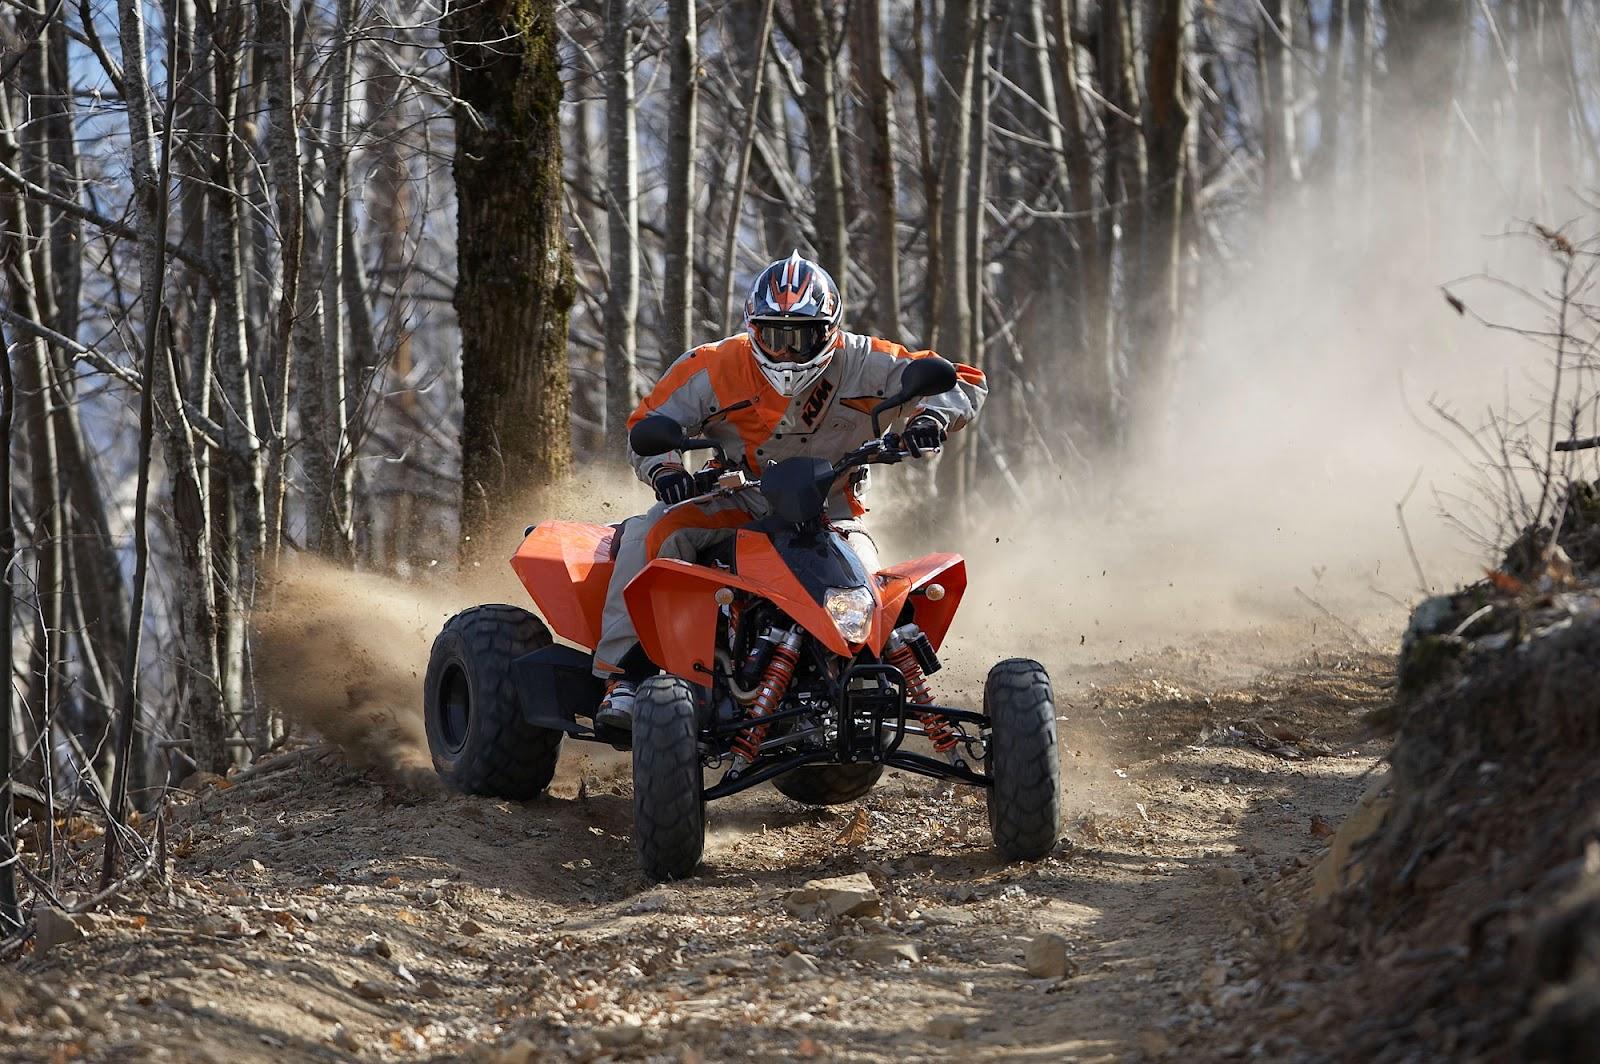 http://3.bp.blogspot.com/-UAVWHS-Z_A8/T4CKr3MuNsI/AAAAAAAABAk/ner67z3eT9Q/s1600/KTM+525XC+ATV+2012+ATV+Pictures+04.jpg